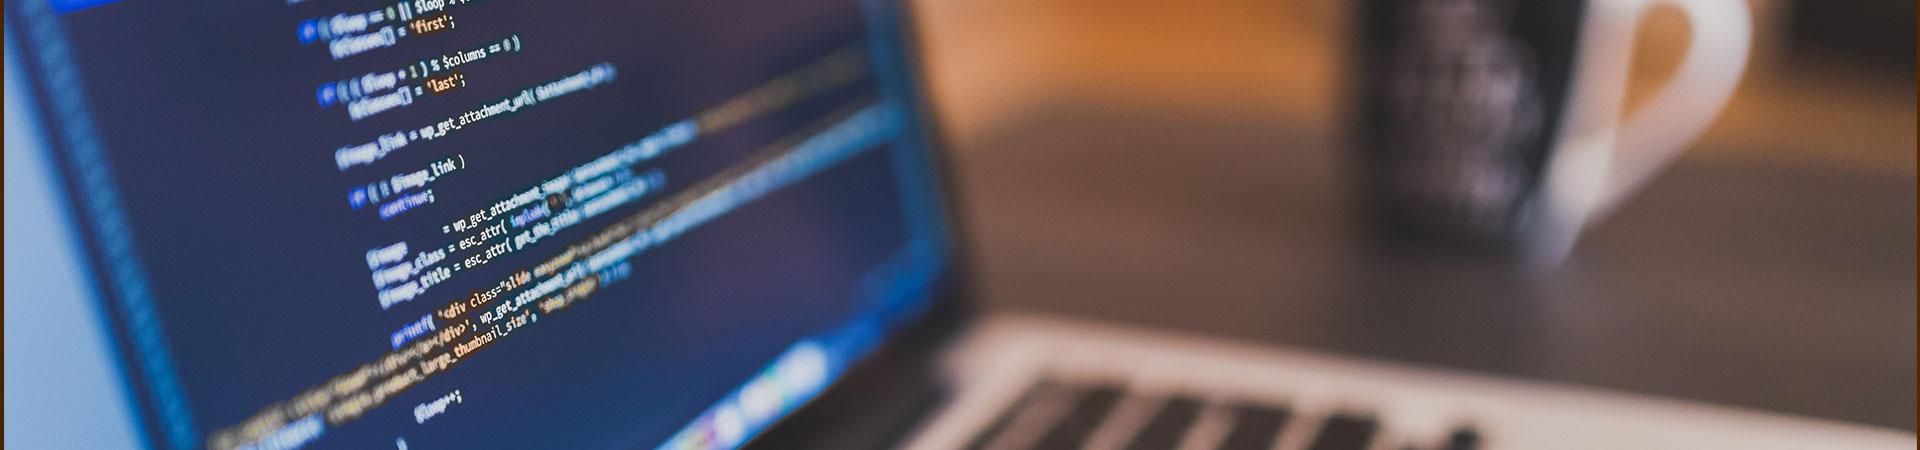 Problema al actualizar Joomla! 3.5 con Ari Image Slider